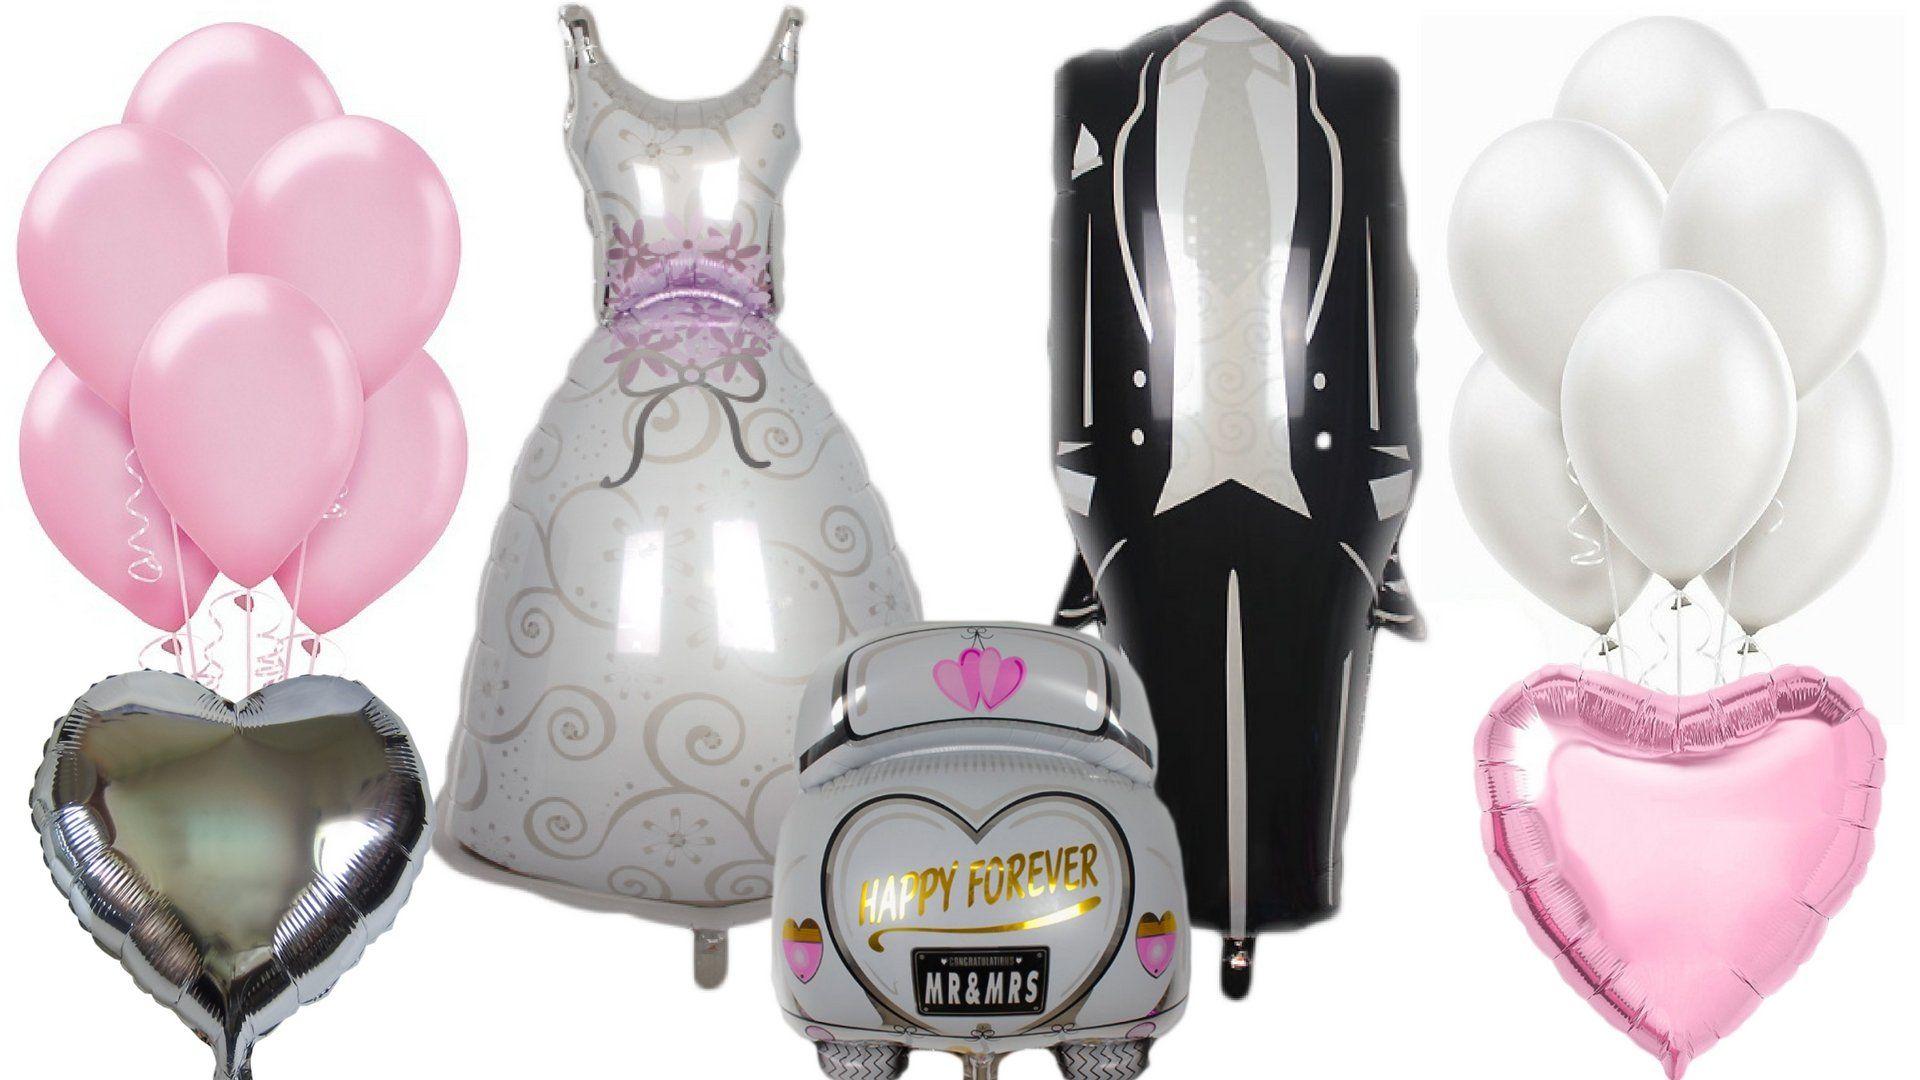 Giant 46 bride groom mylar balloons pink white 12 latex pearl giant 46 bride groom mylar balloons pink white 12 latex pearl heart wedding decoration junglespirit Gallery